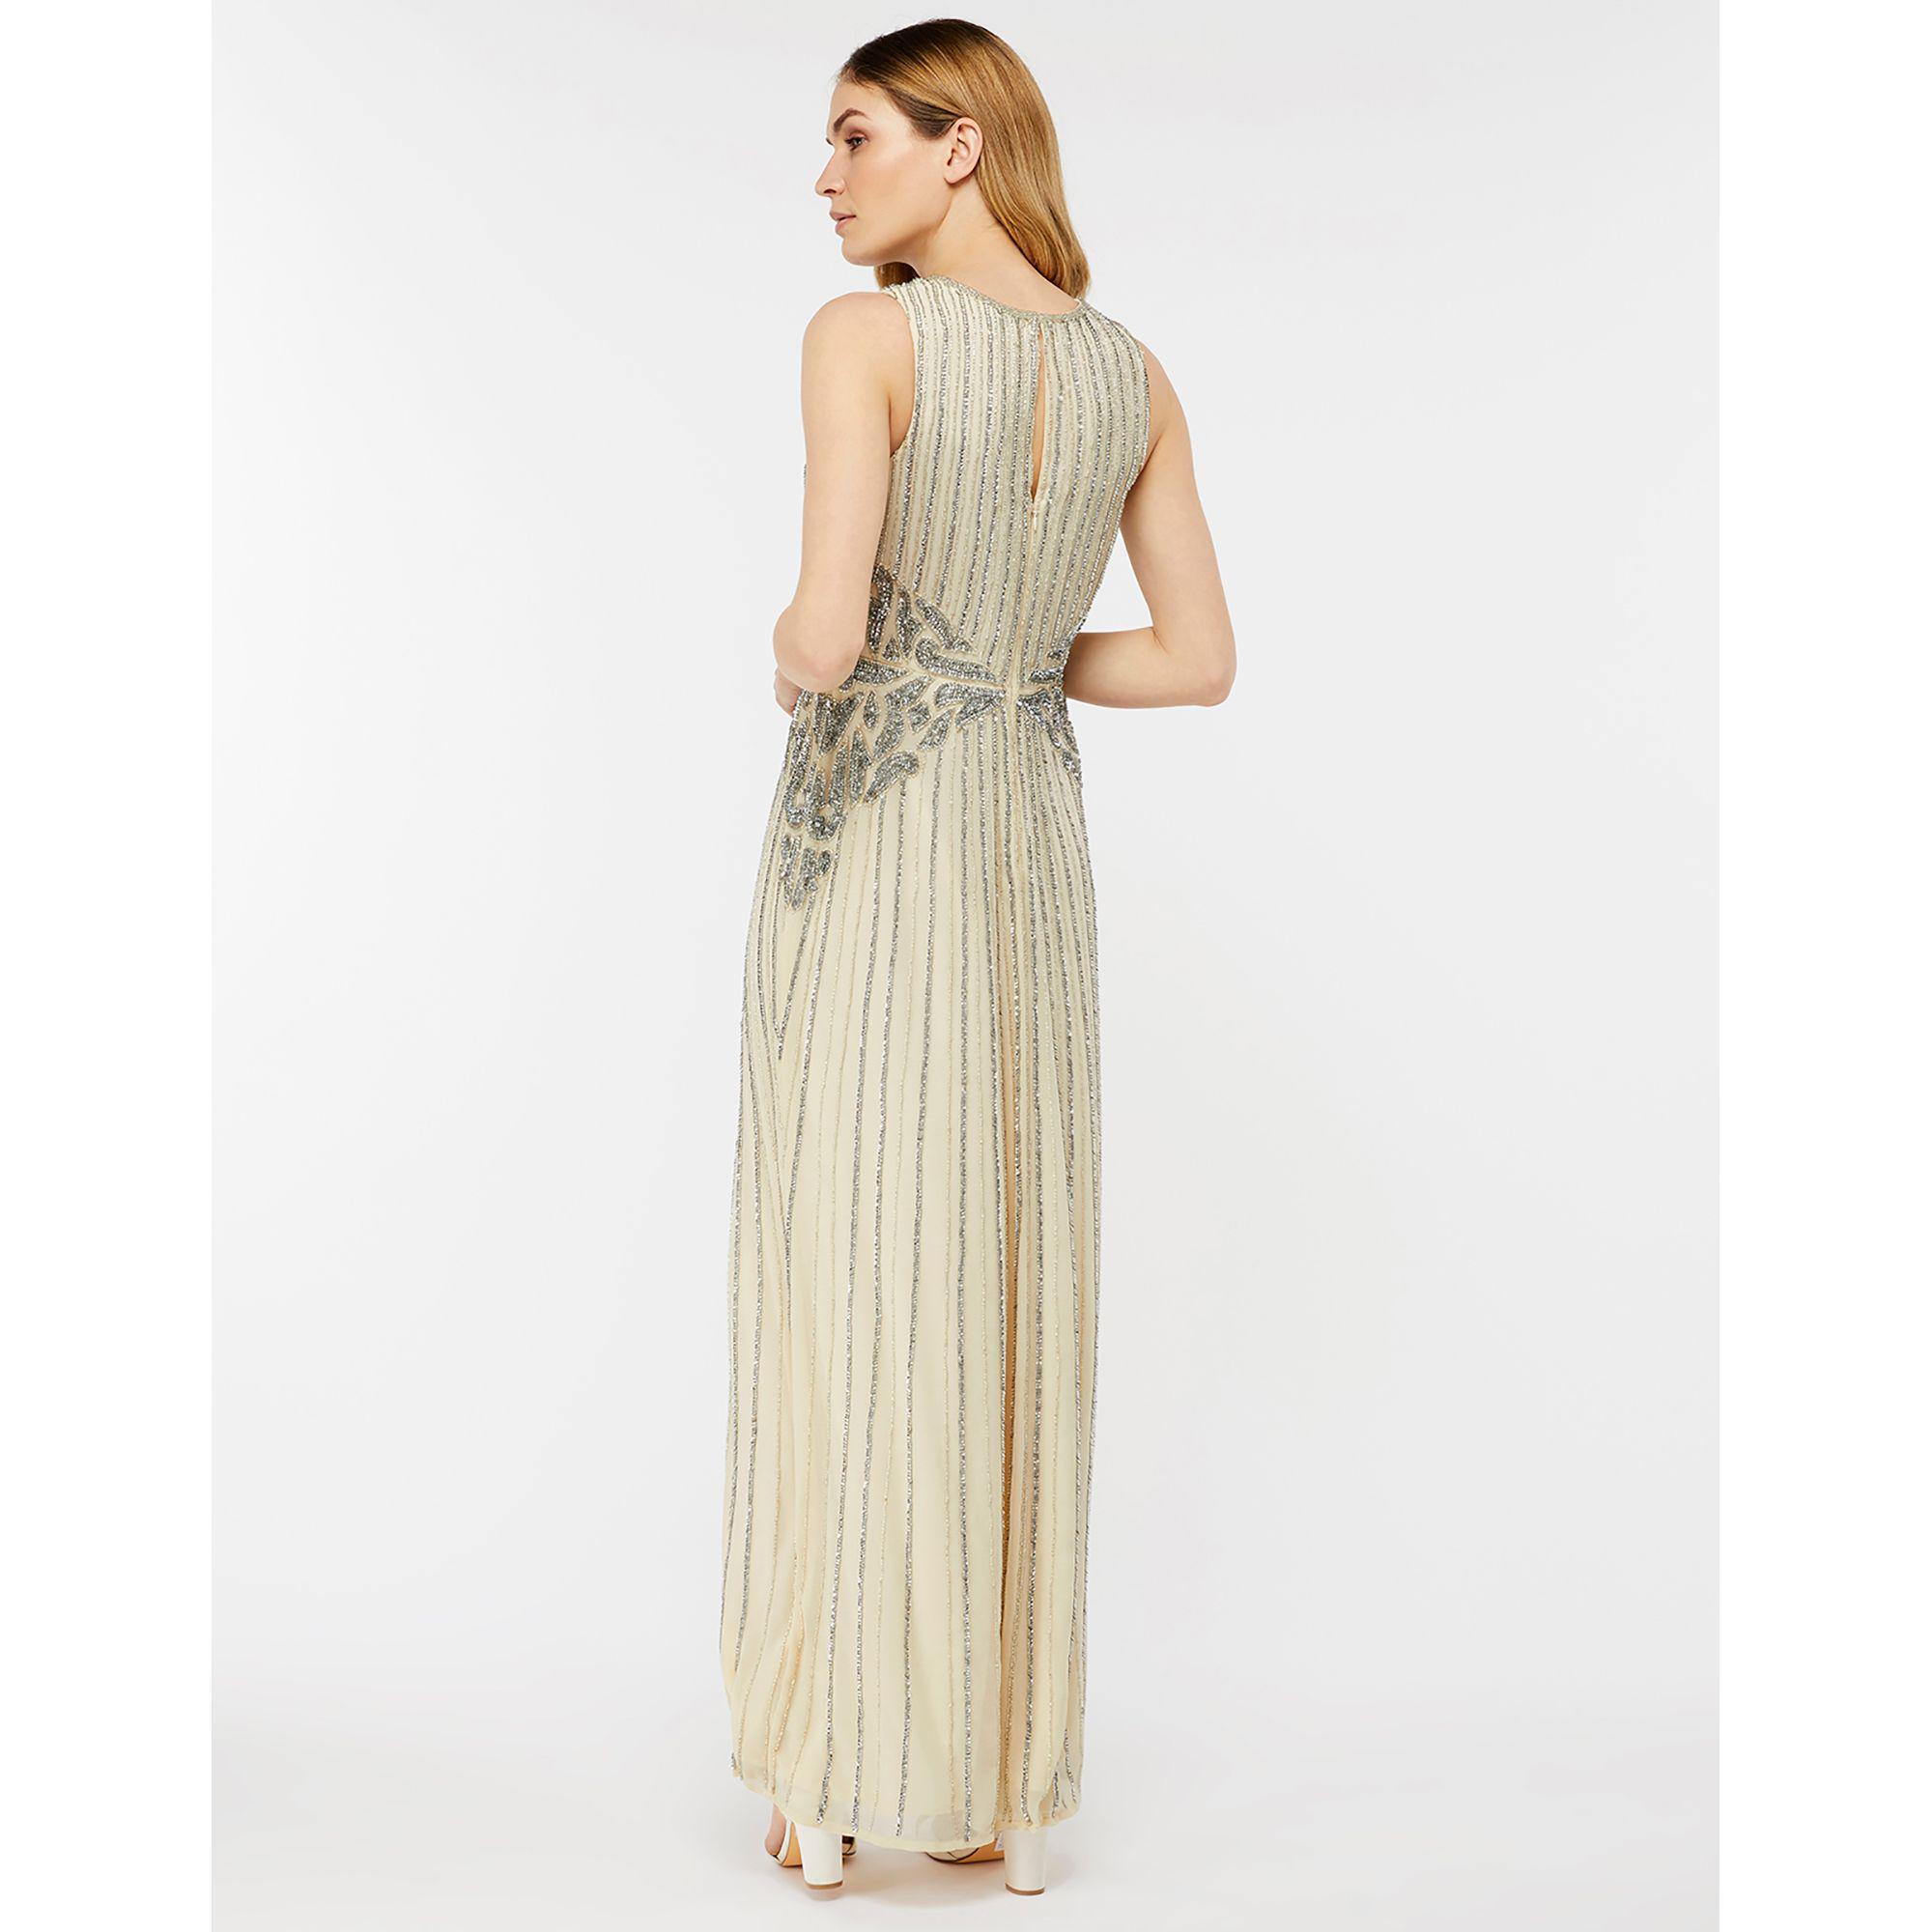 111f71d540 Debenhams Monsoon Maxi Dresses – DACC